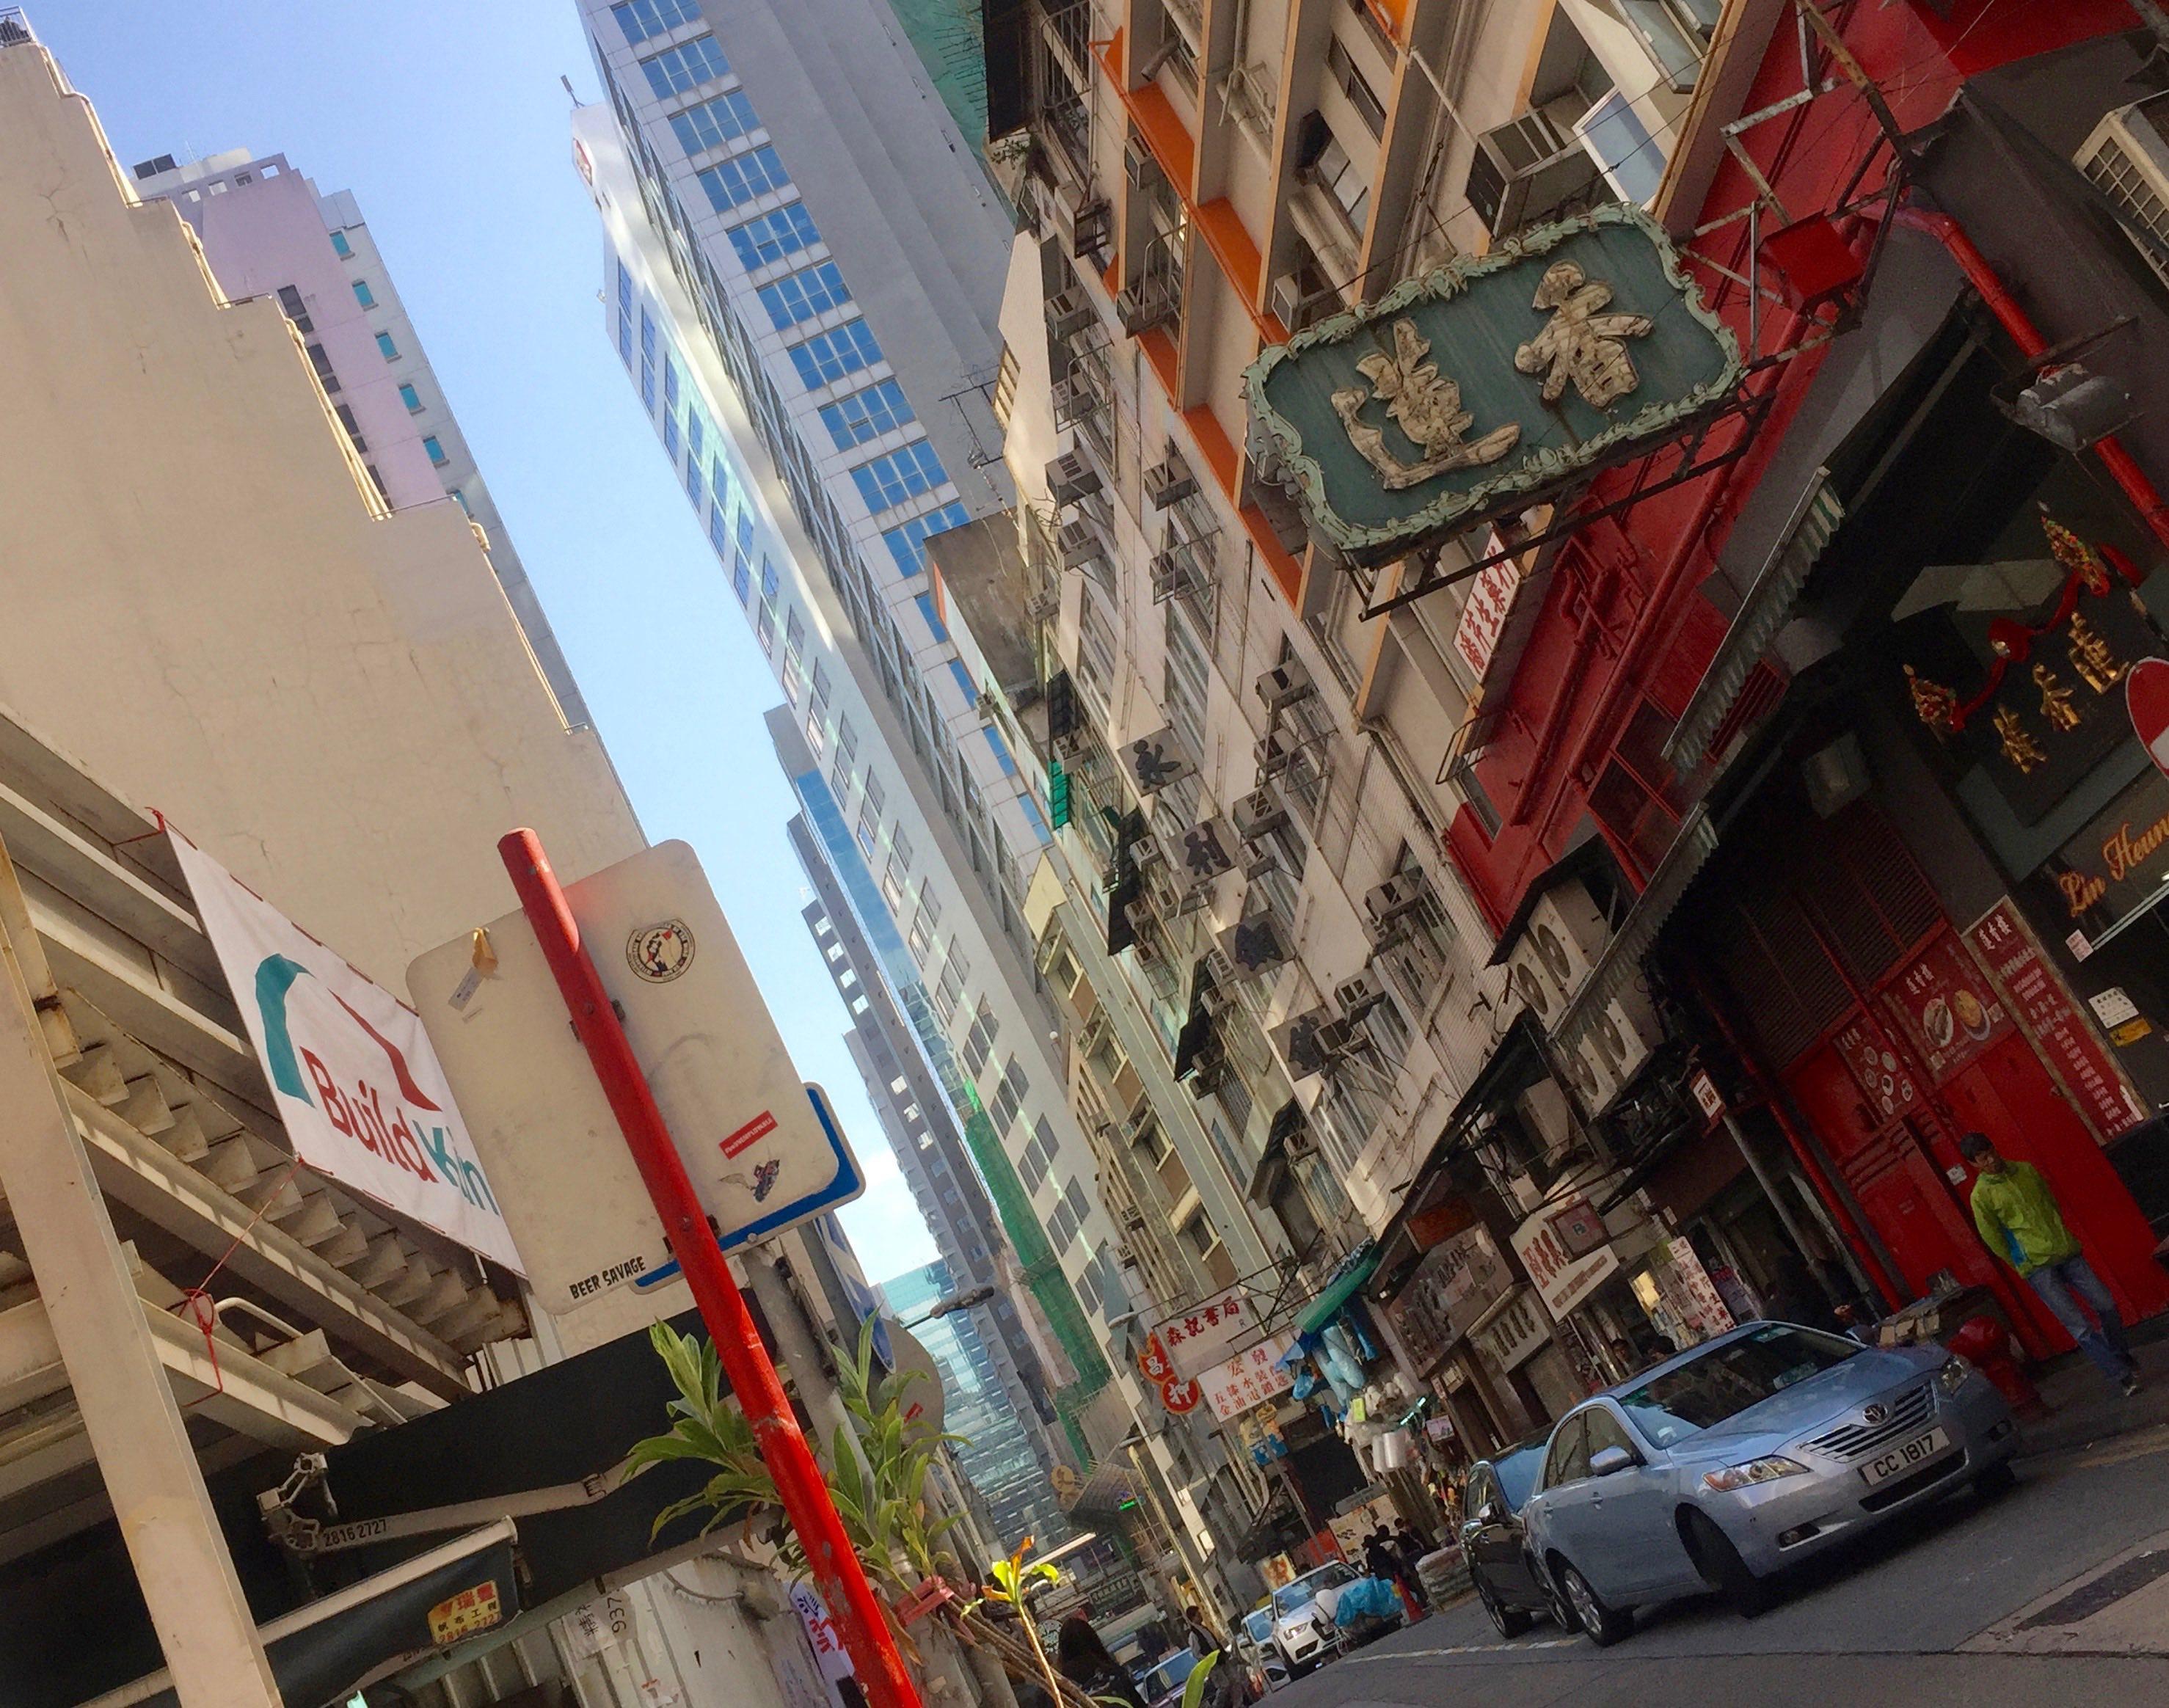 HK Central Wellington Street restaurants East meet West